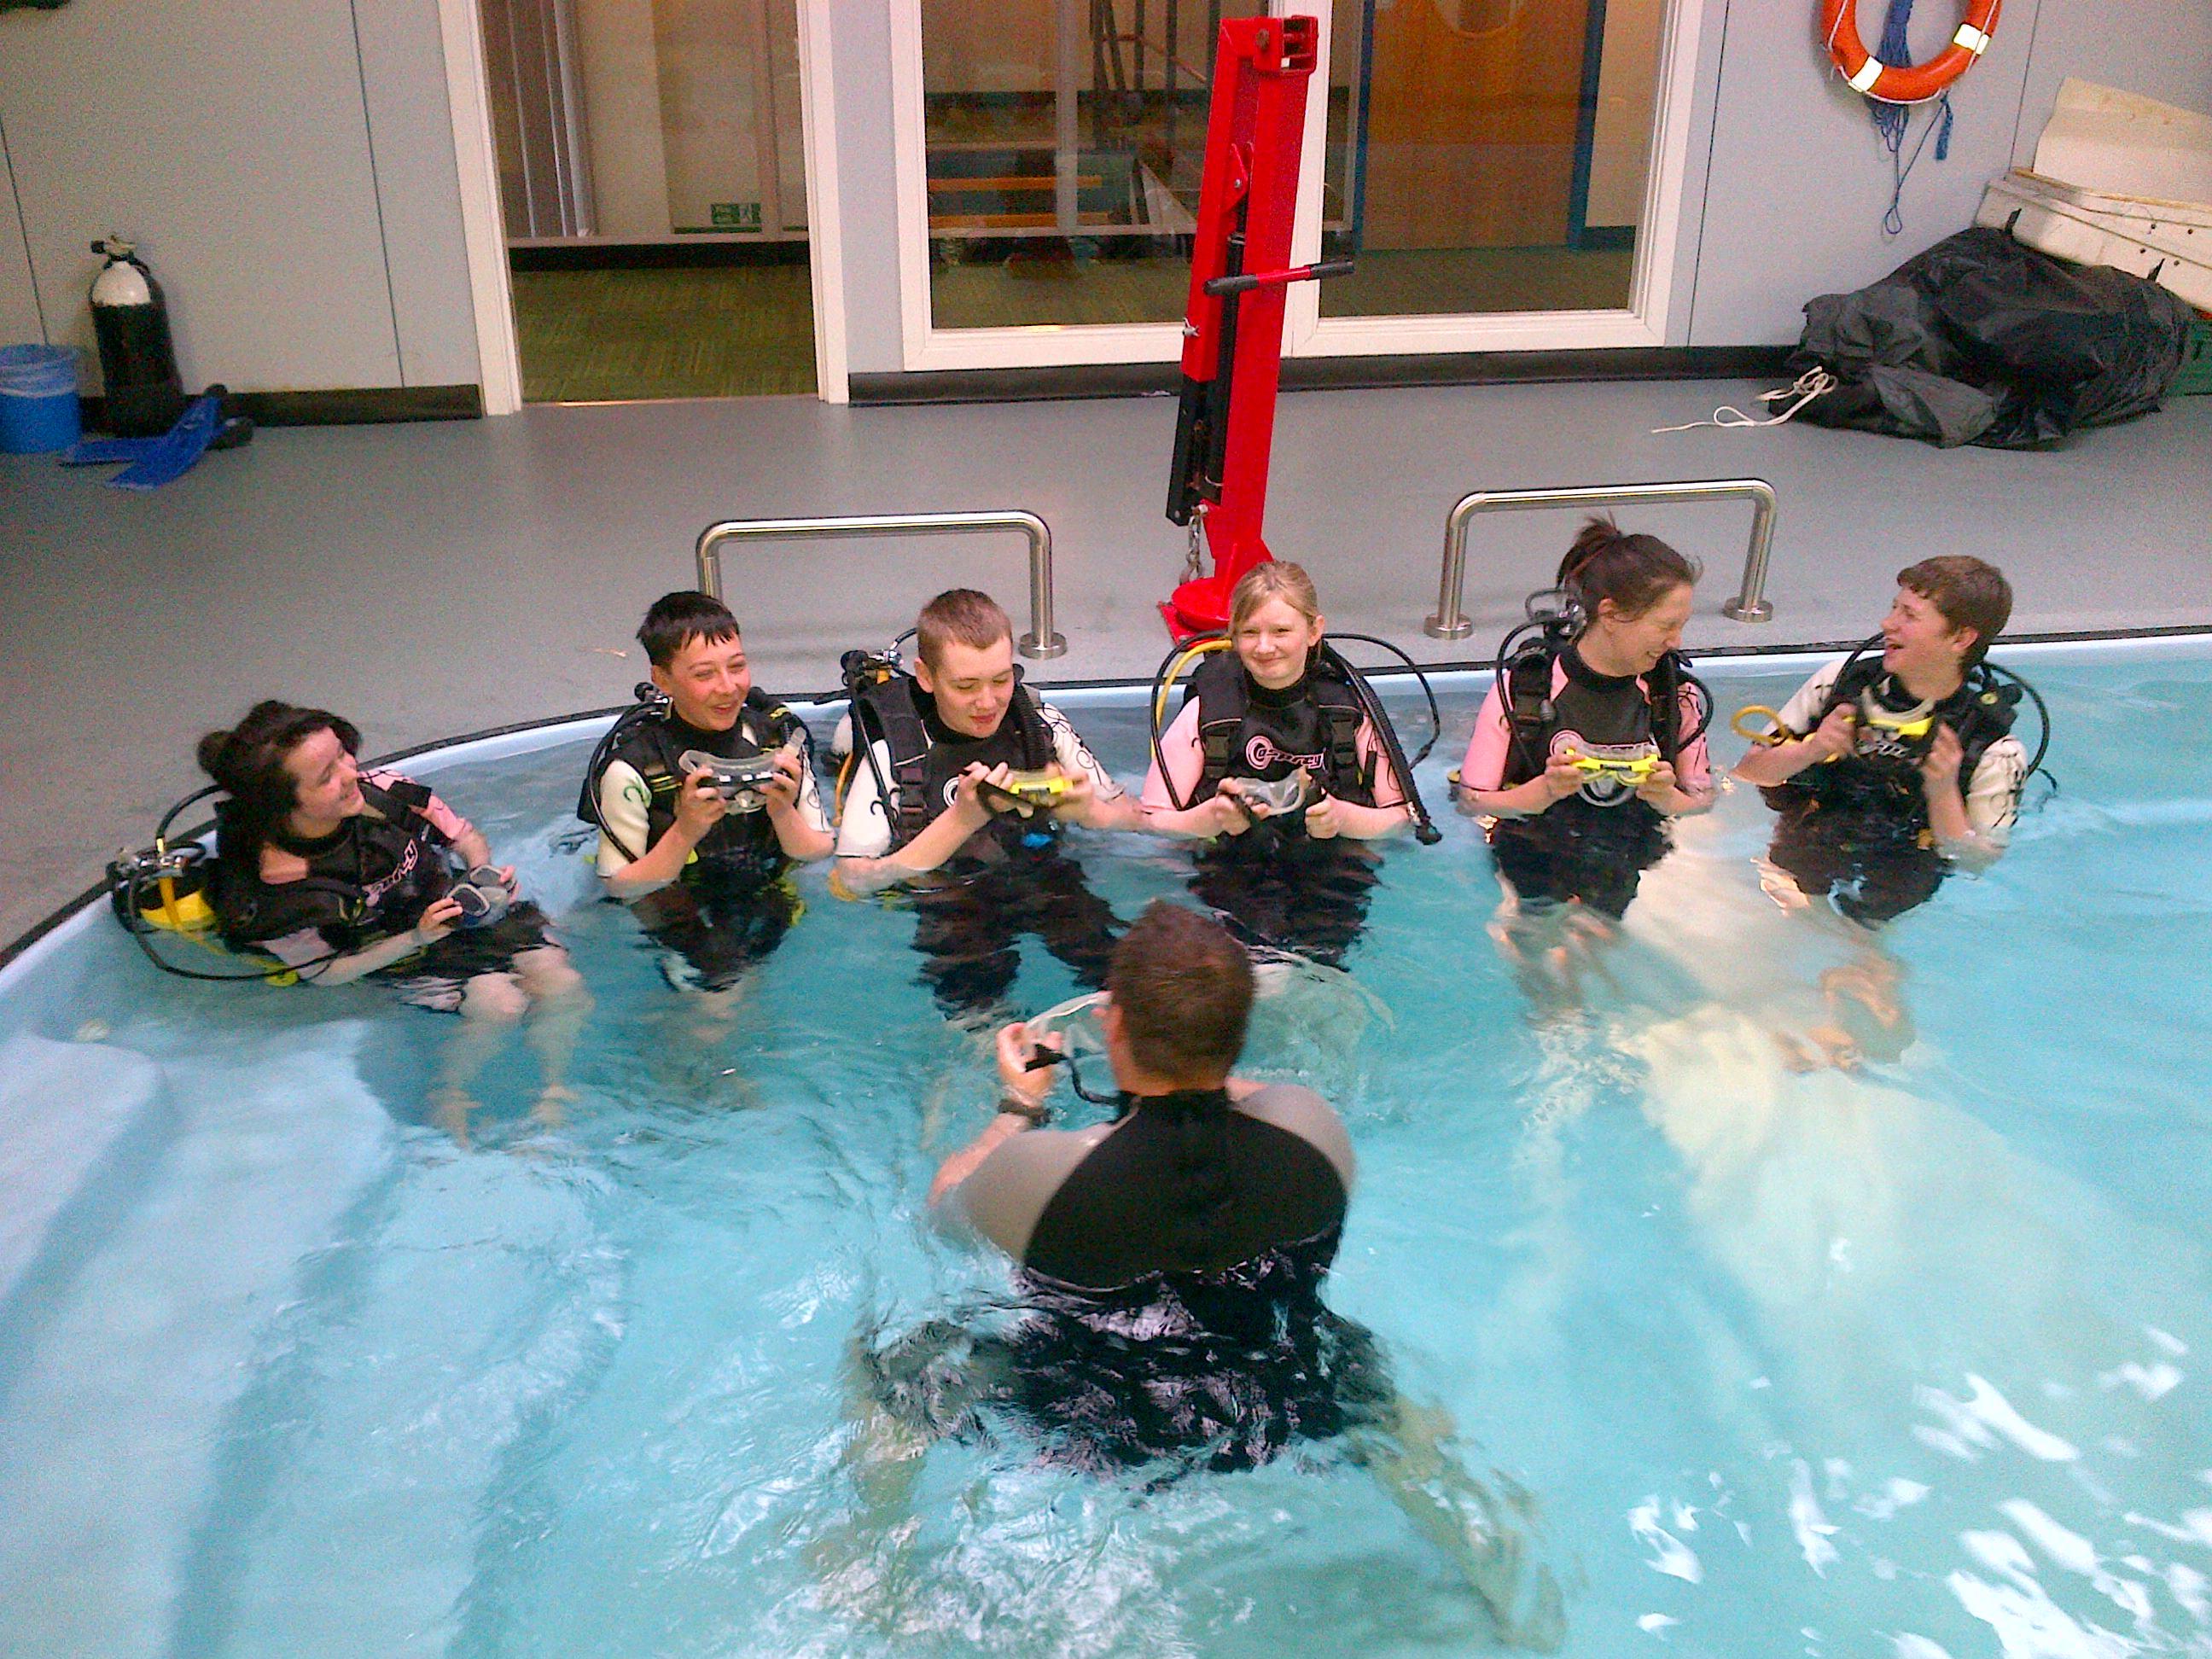 Scuba Diving in Liverpool - localgymsandfitness.com